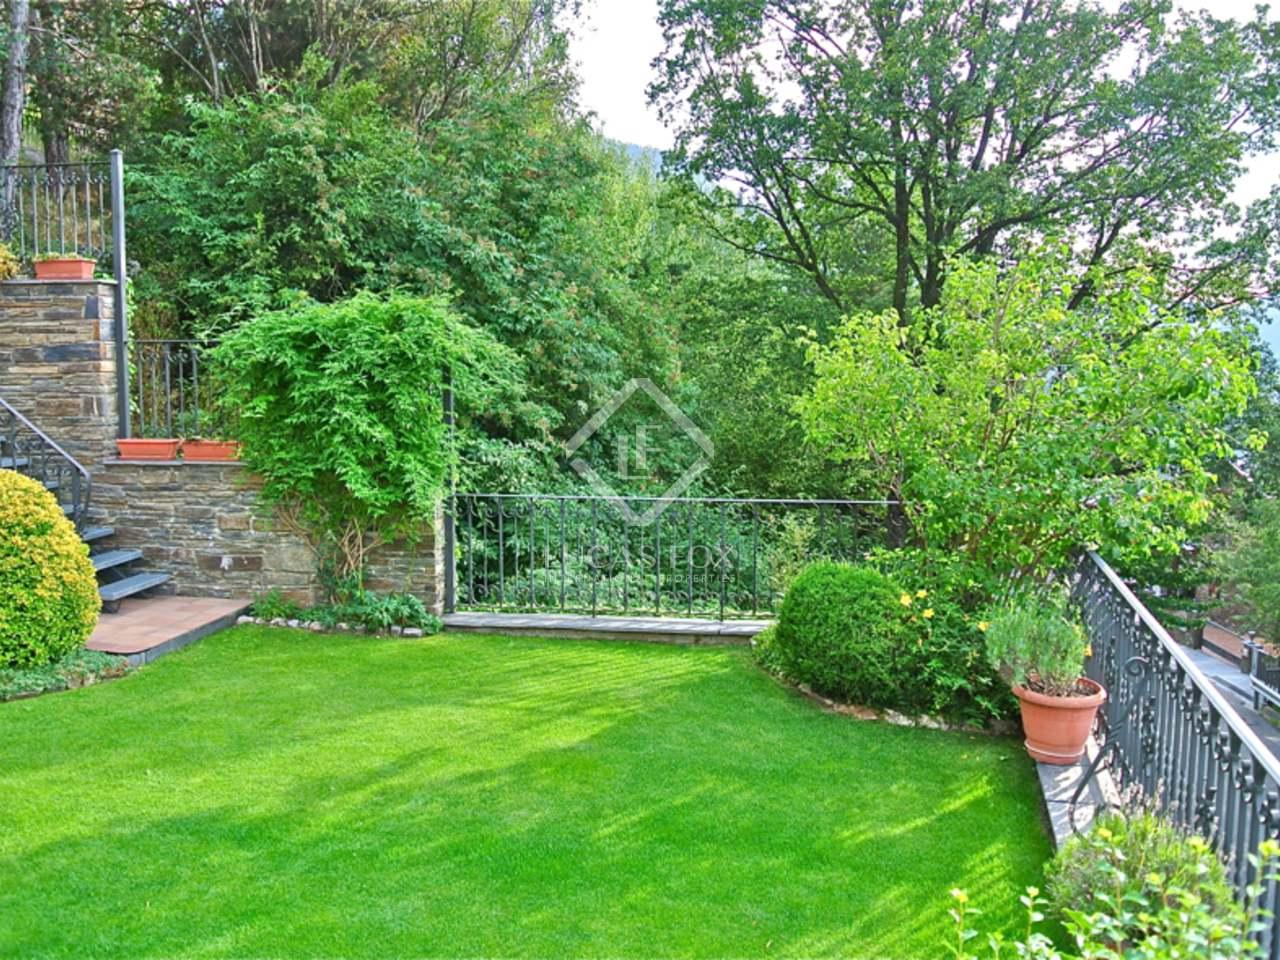 Maison villa de 600m a vendre andorra la vella avec for Jardin anglais caracteristiques